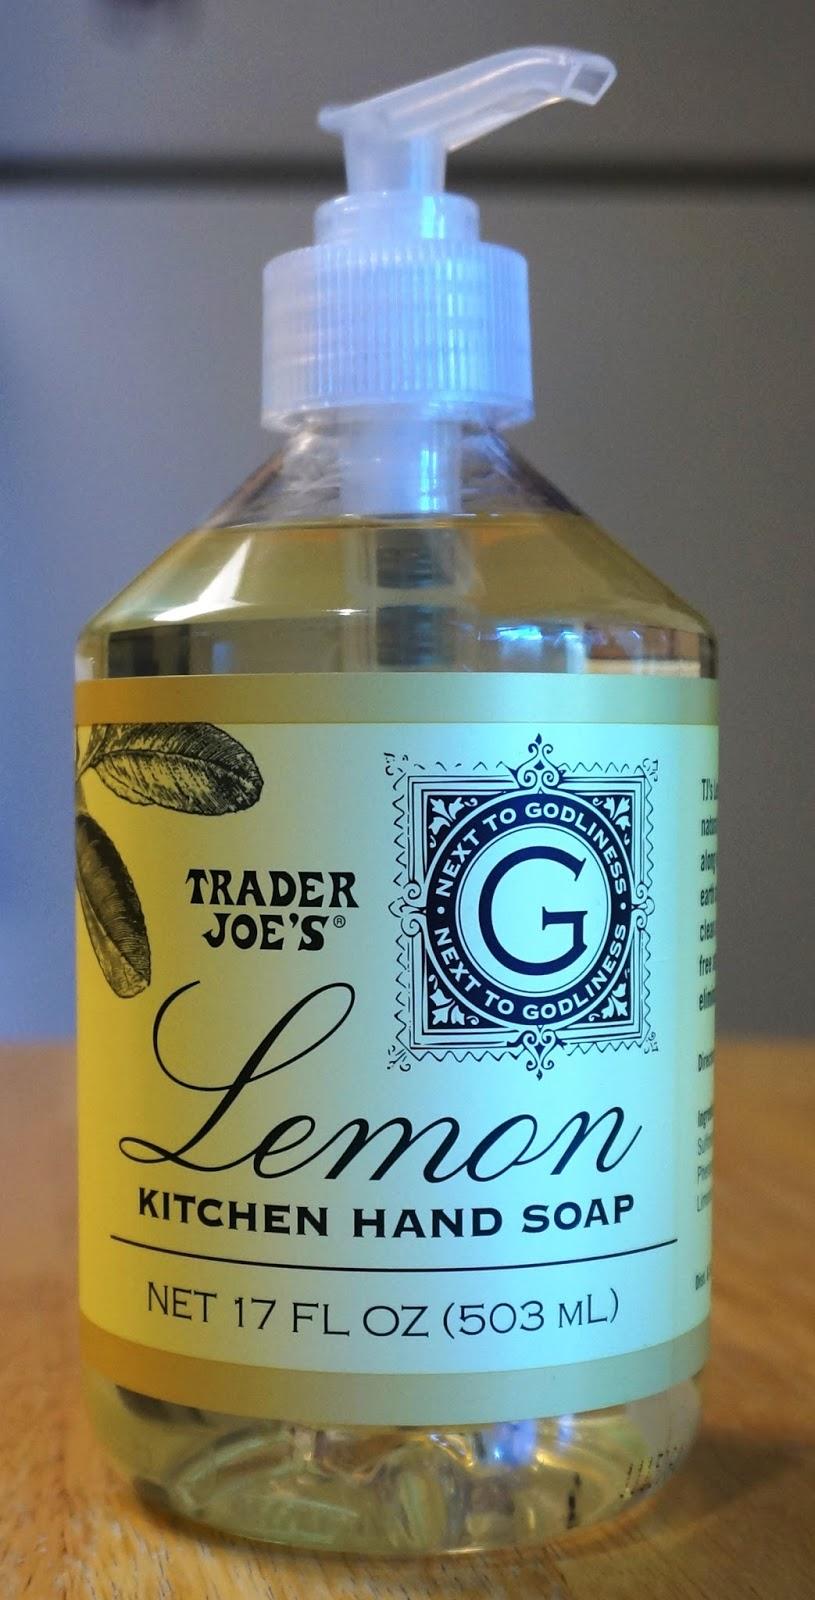 Kitchen Hand Soap Recycled Kitchens Exploring Trader Joe S Lemon